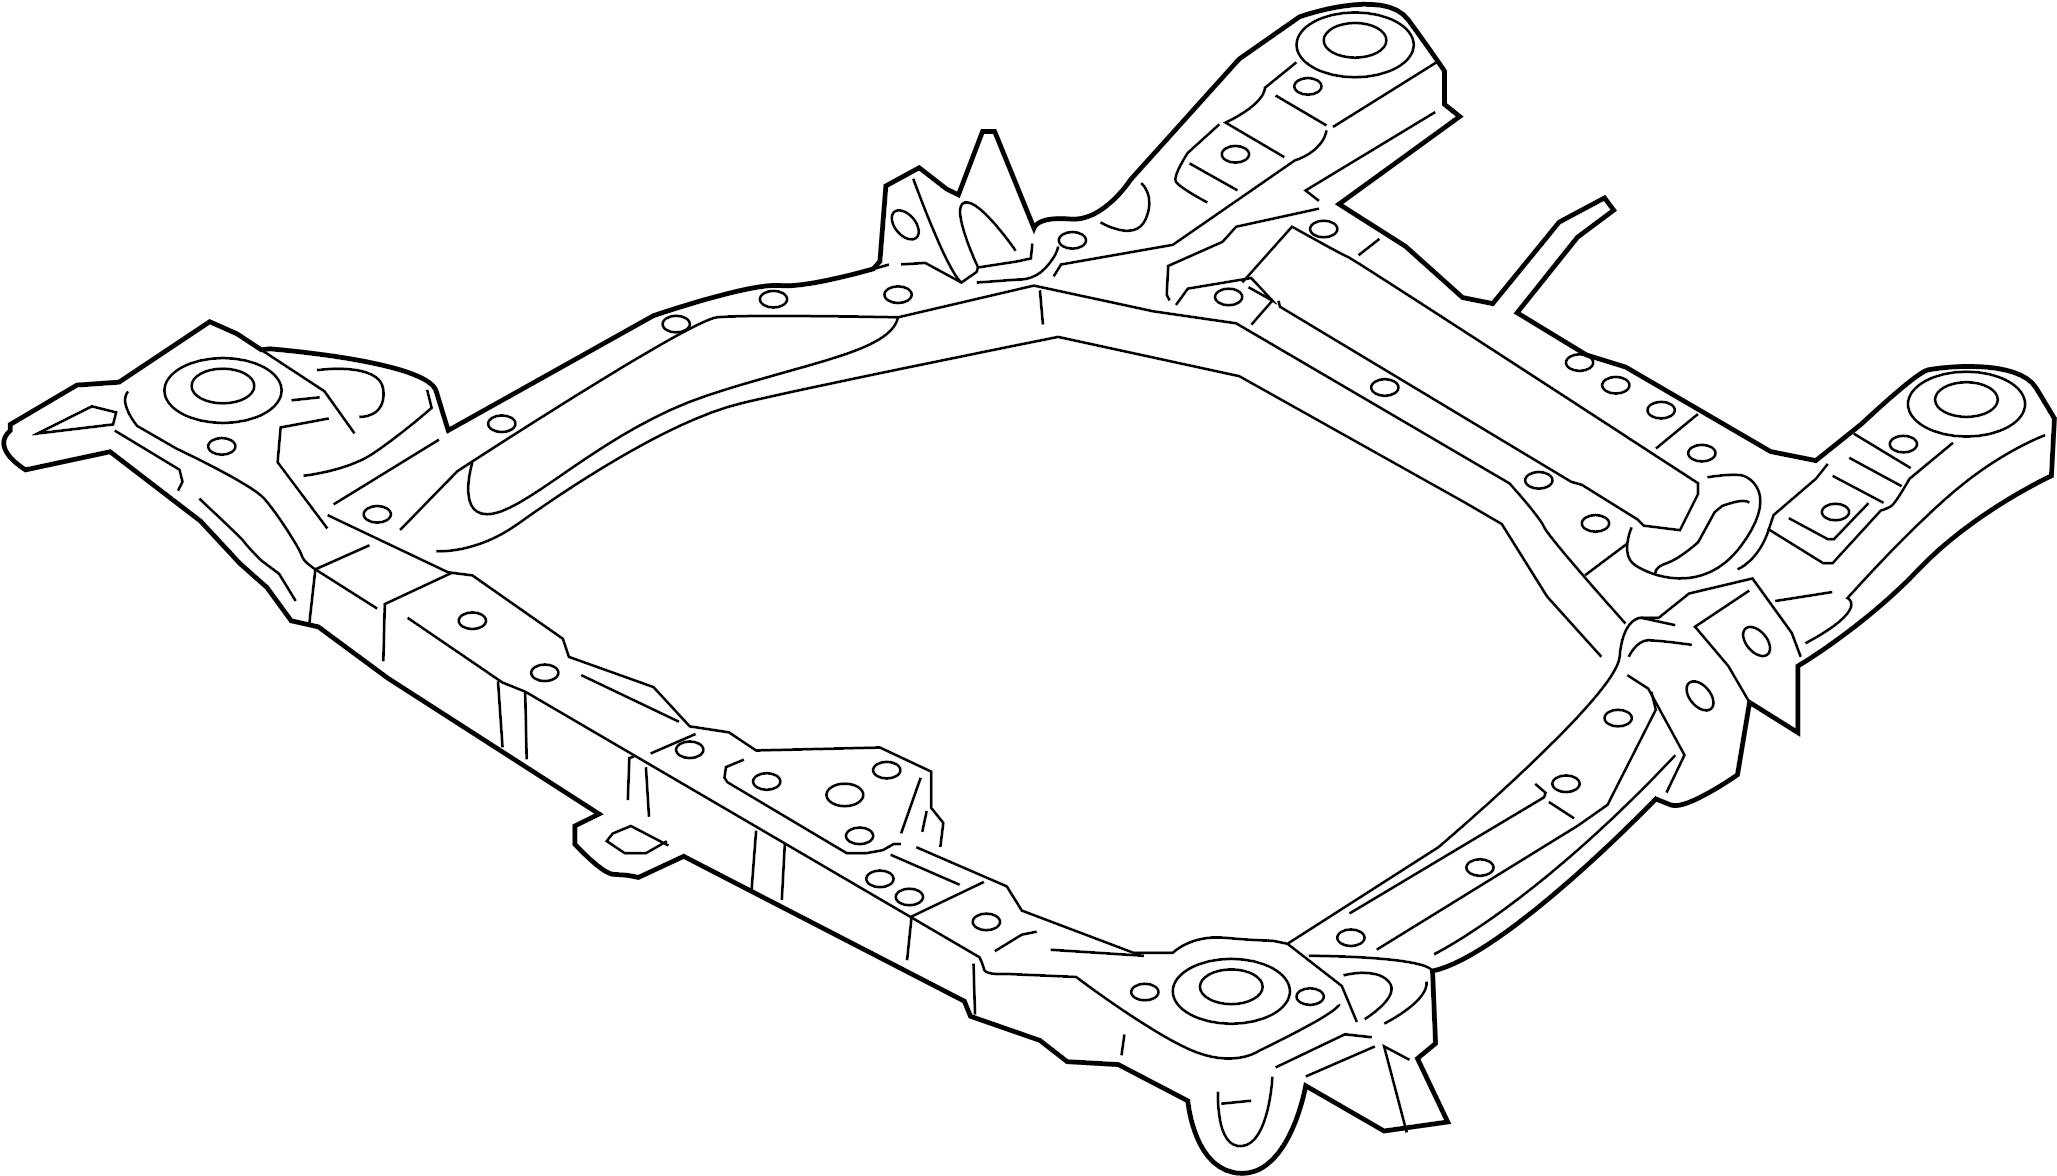 2002 hyundai santa fe parts diagram cardiac arteries transmission filter location